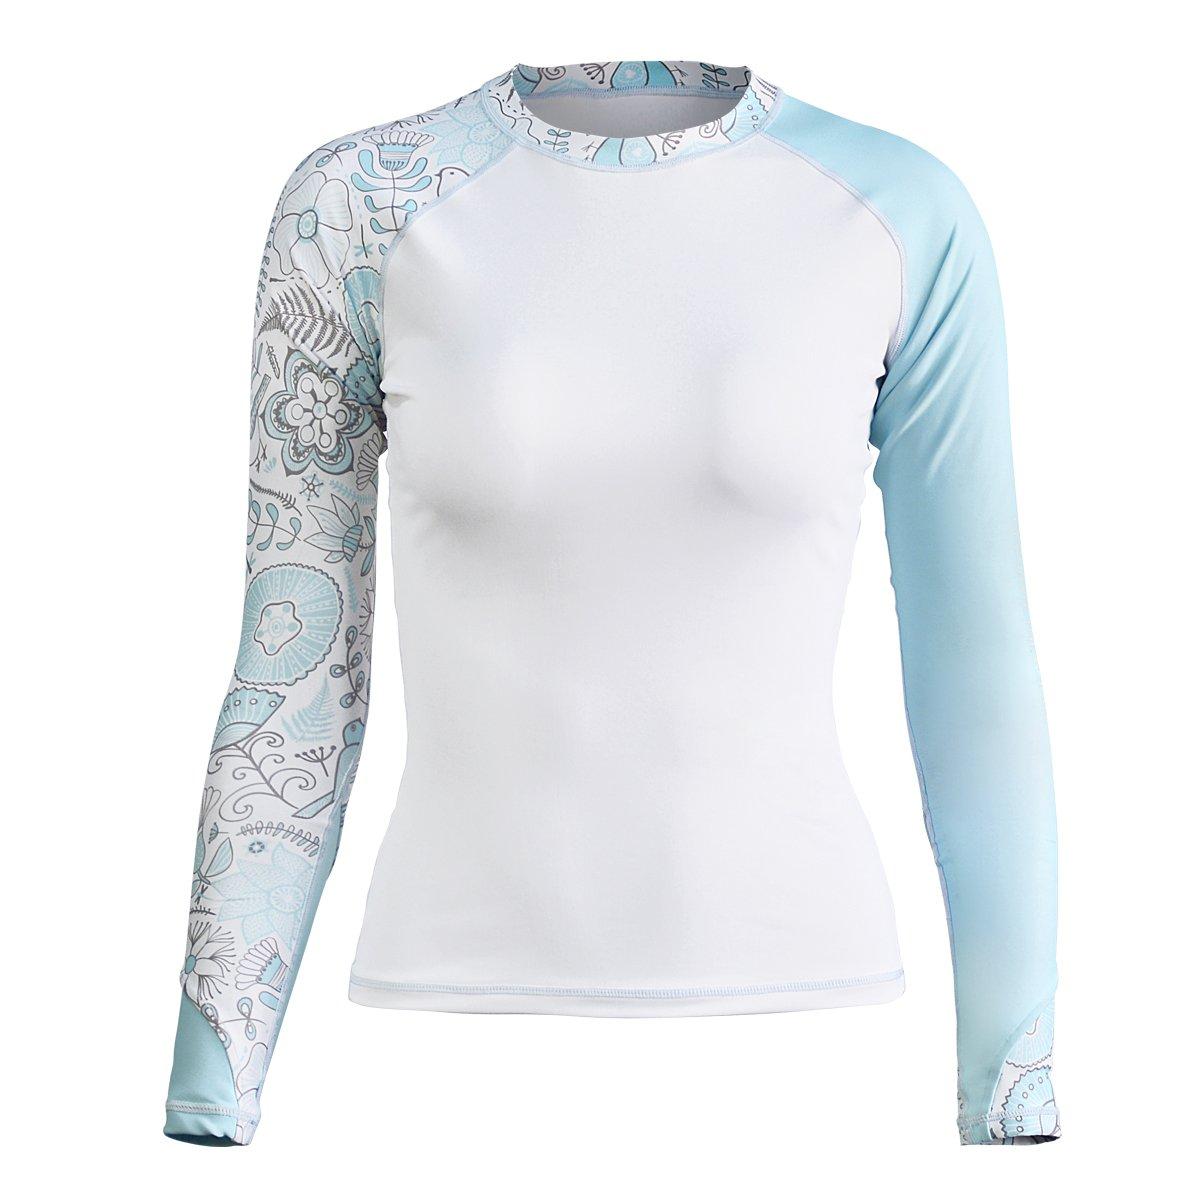 LEEYA Women's UV Sun Protection Rash Guard Long Sleeve Swimsuit Top Bathing Suit (White+Blue, Medium)